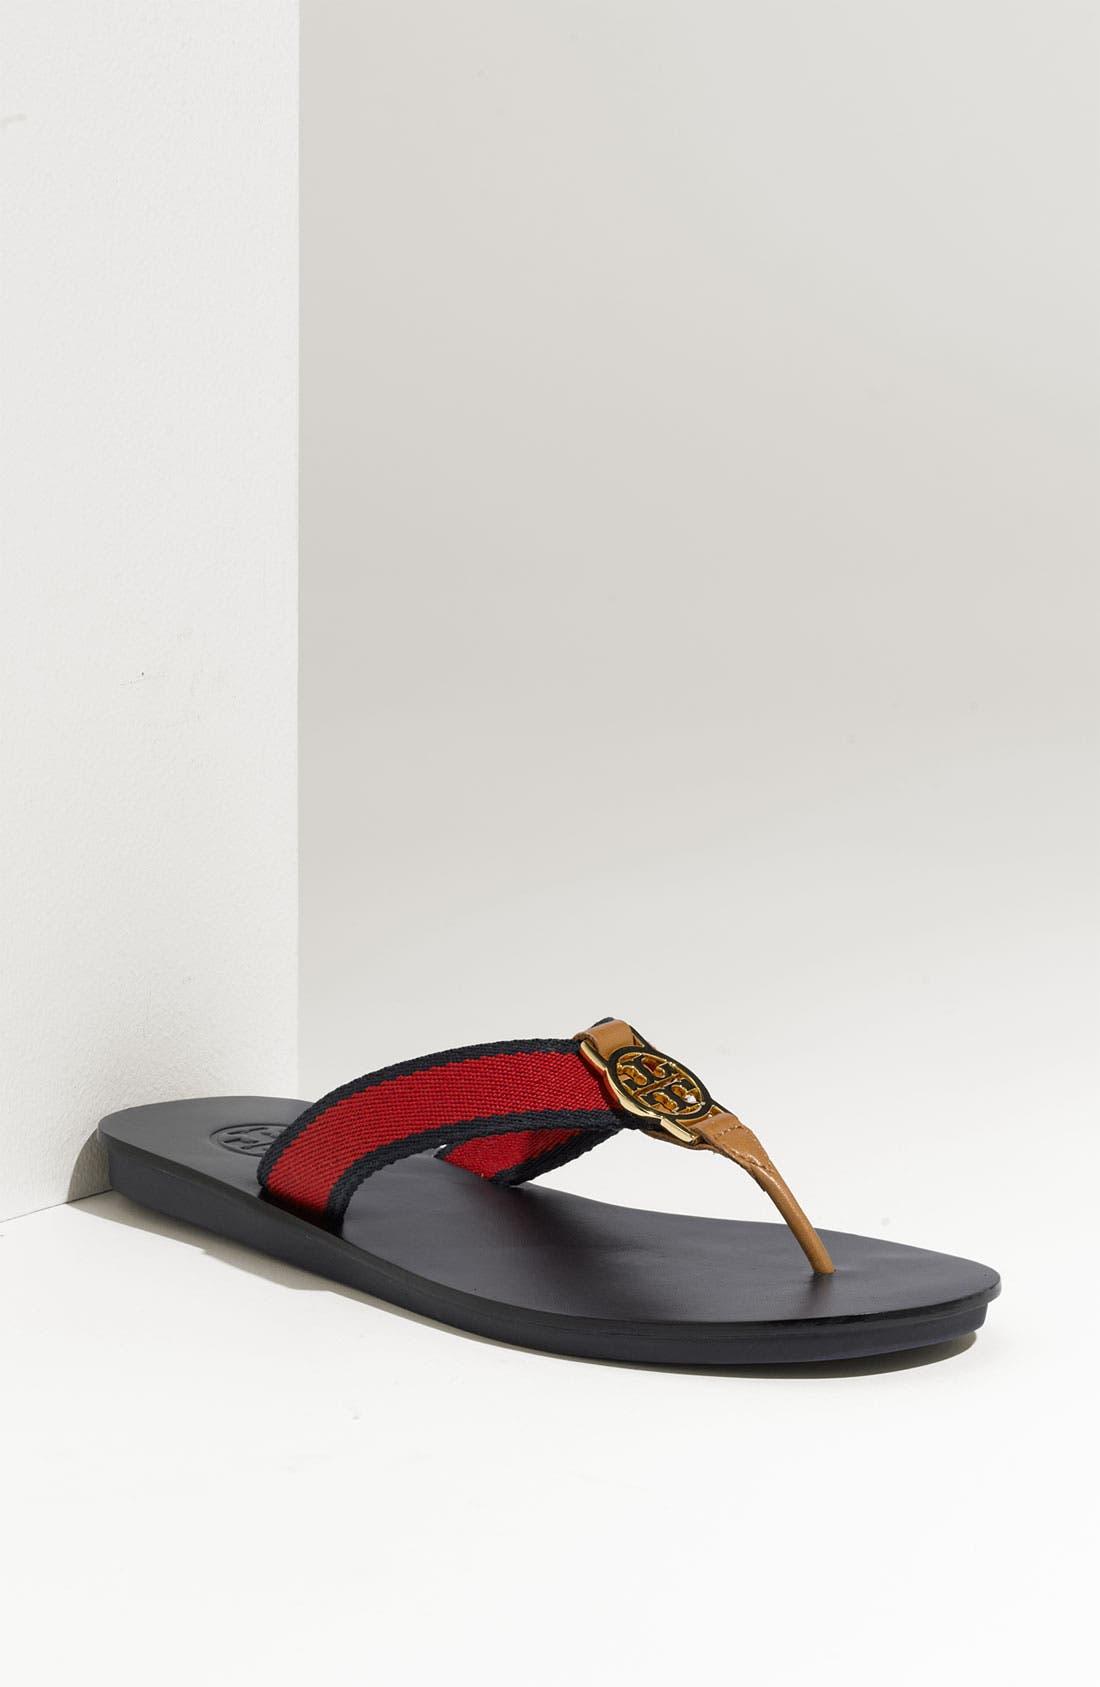 Alternate Image 1 Selected - Tory Burch 'Lise' Thong Sandal